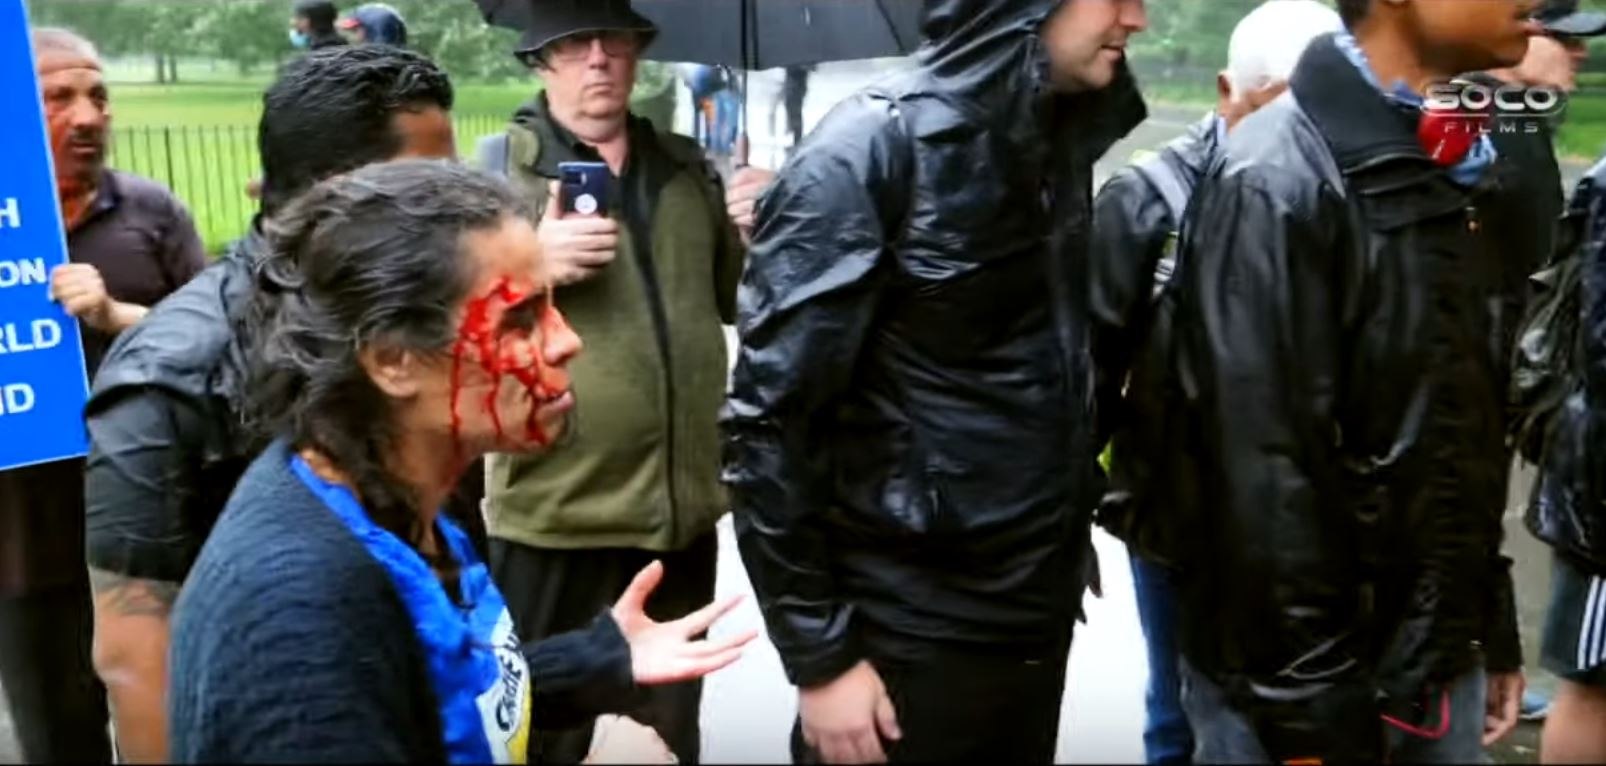 "The Christian speaker Hatun Tash after being attacked on 25 July. / Video: Soco Films via <a target=""_blank"" href=""https://www.youtube.com/channel/UC-wOxG8p_Nk5nFkSxZOxq6w"">Pfander films</a>.,"